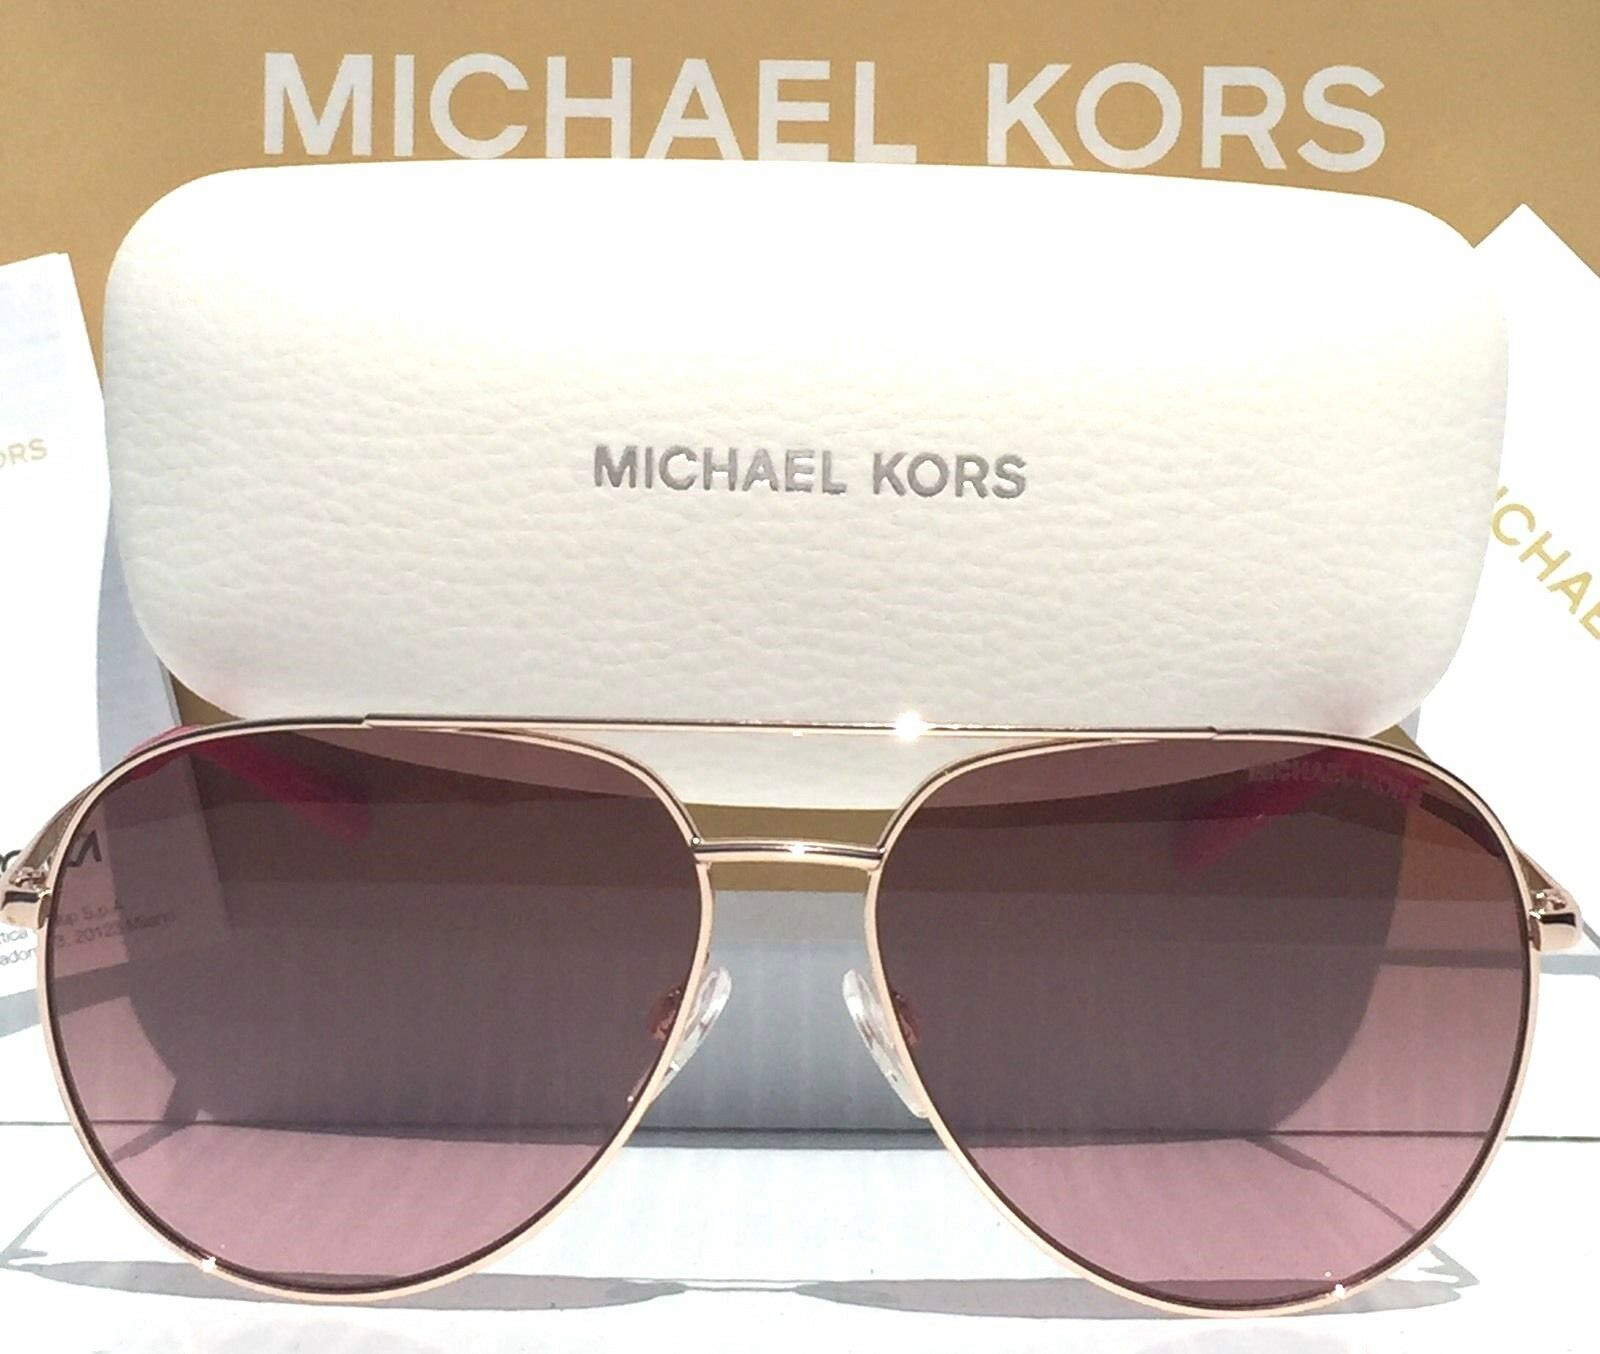 db9f17f1cb95 Michael Kors Sunglasses M 2066 S Dylan 717 Gold 58 Mm for sale online | eBay